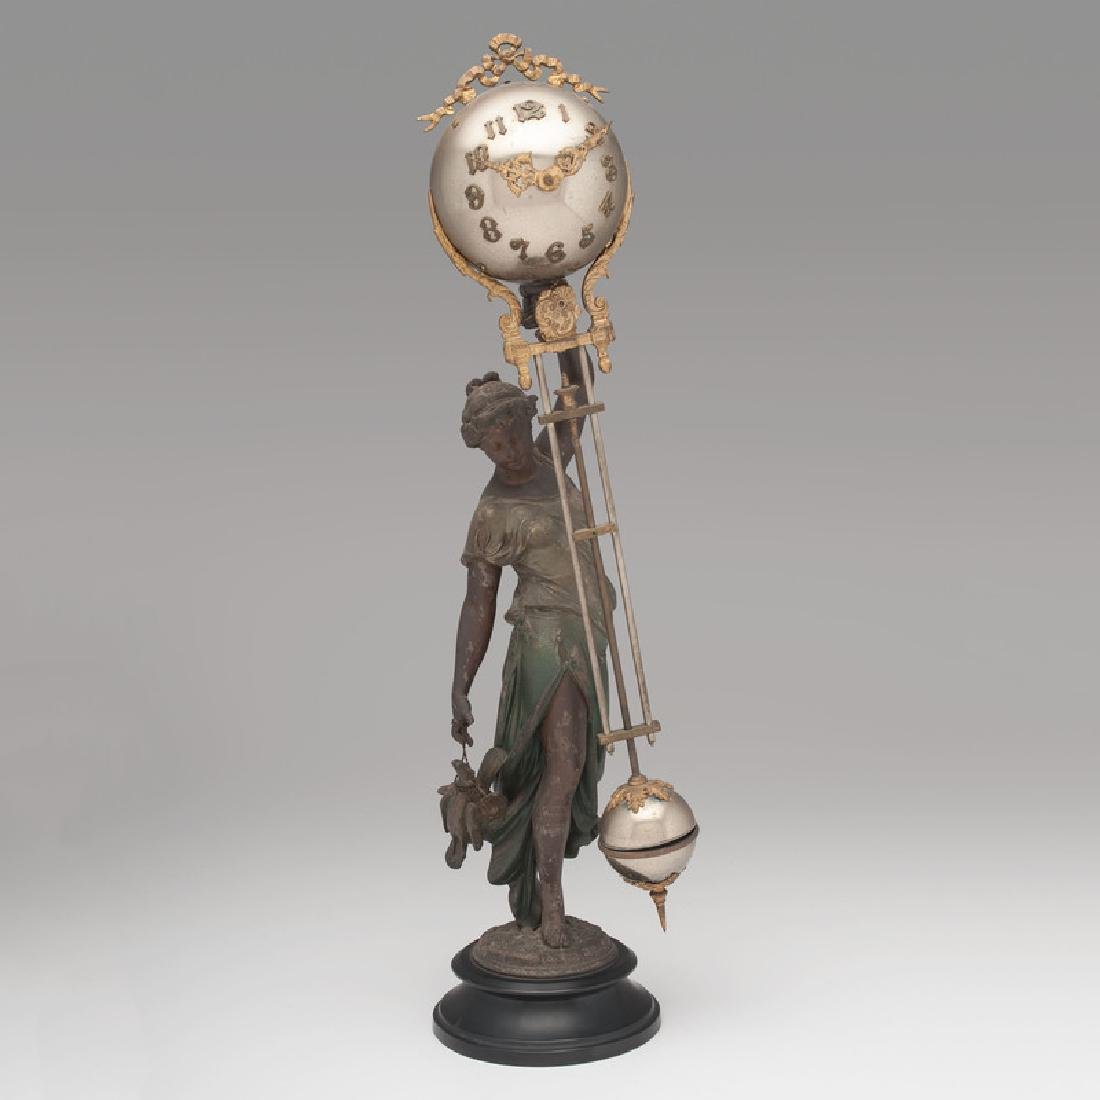 Ansonia Swing Clock, Huntress